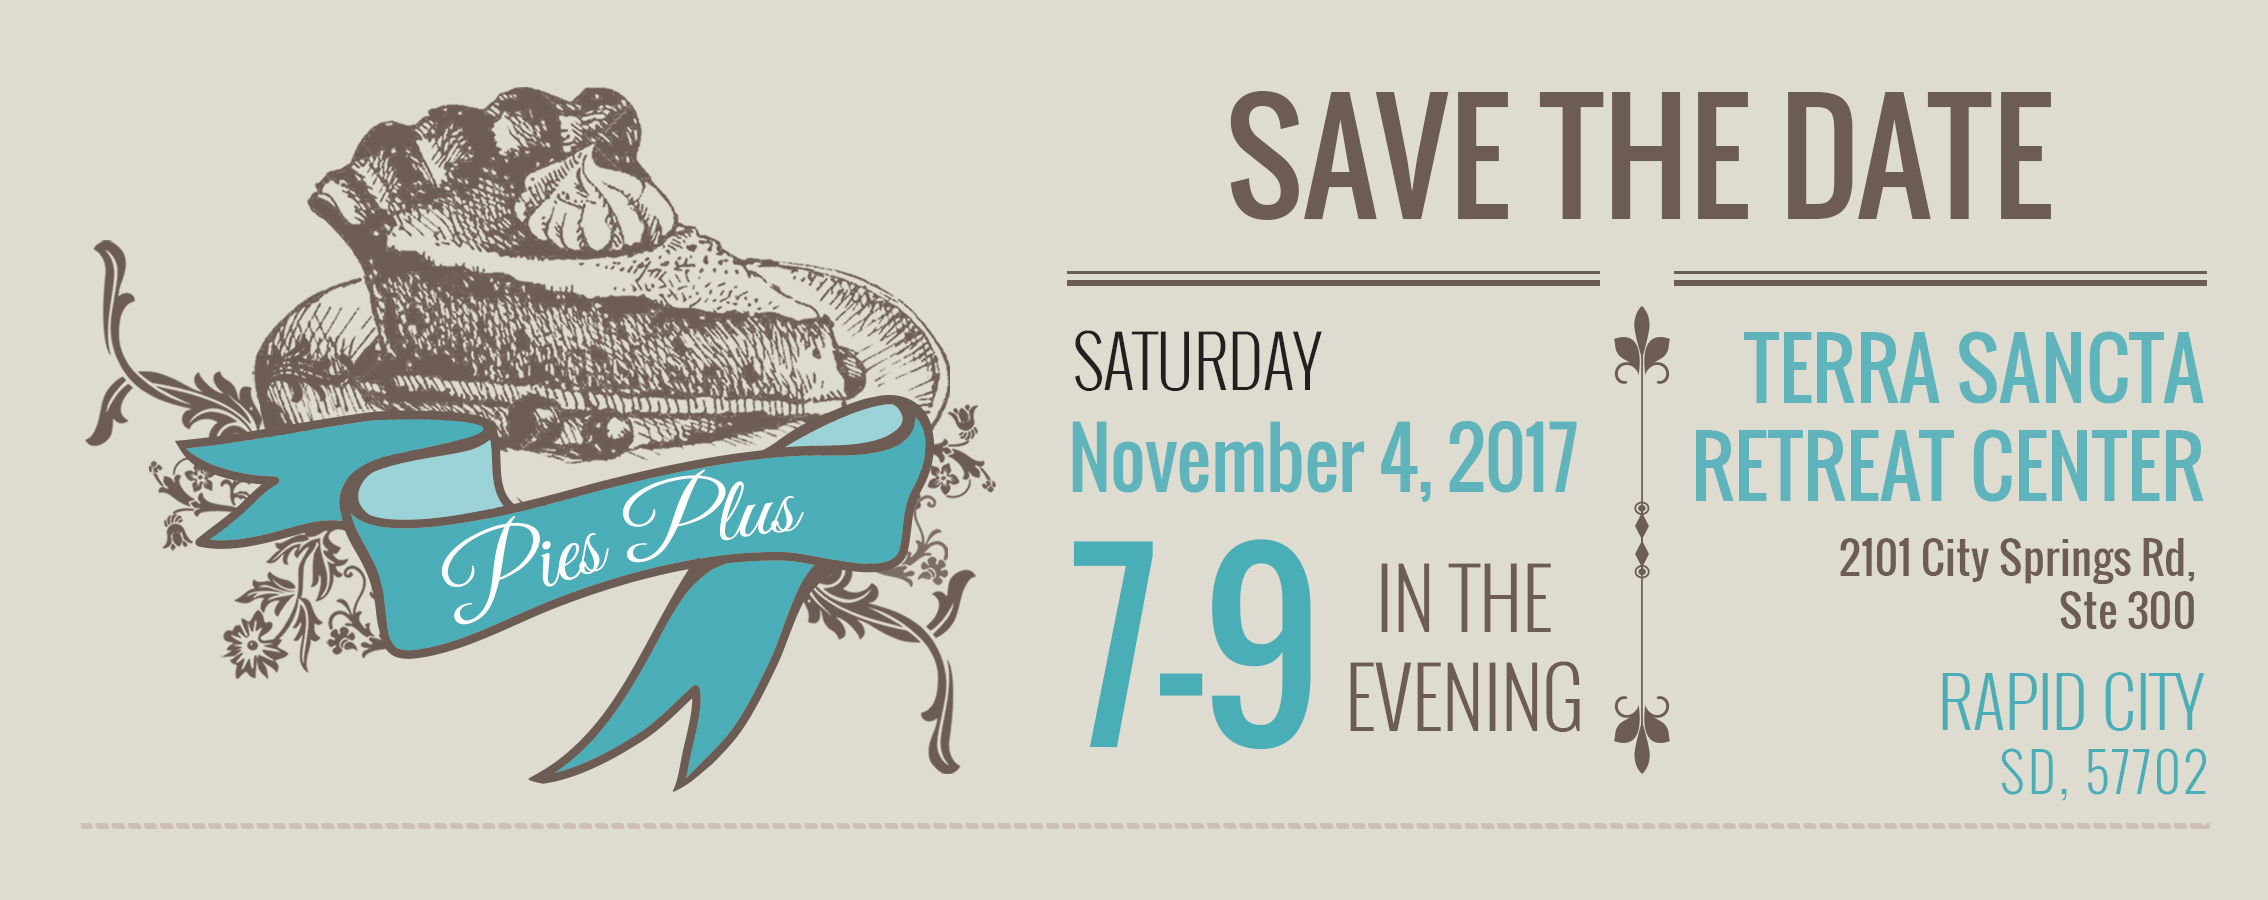 Save the Date NL Nov 2017.jpg